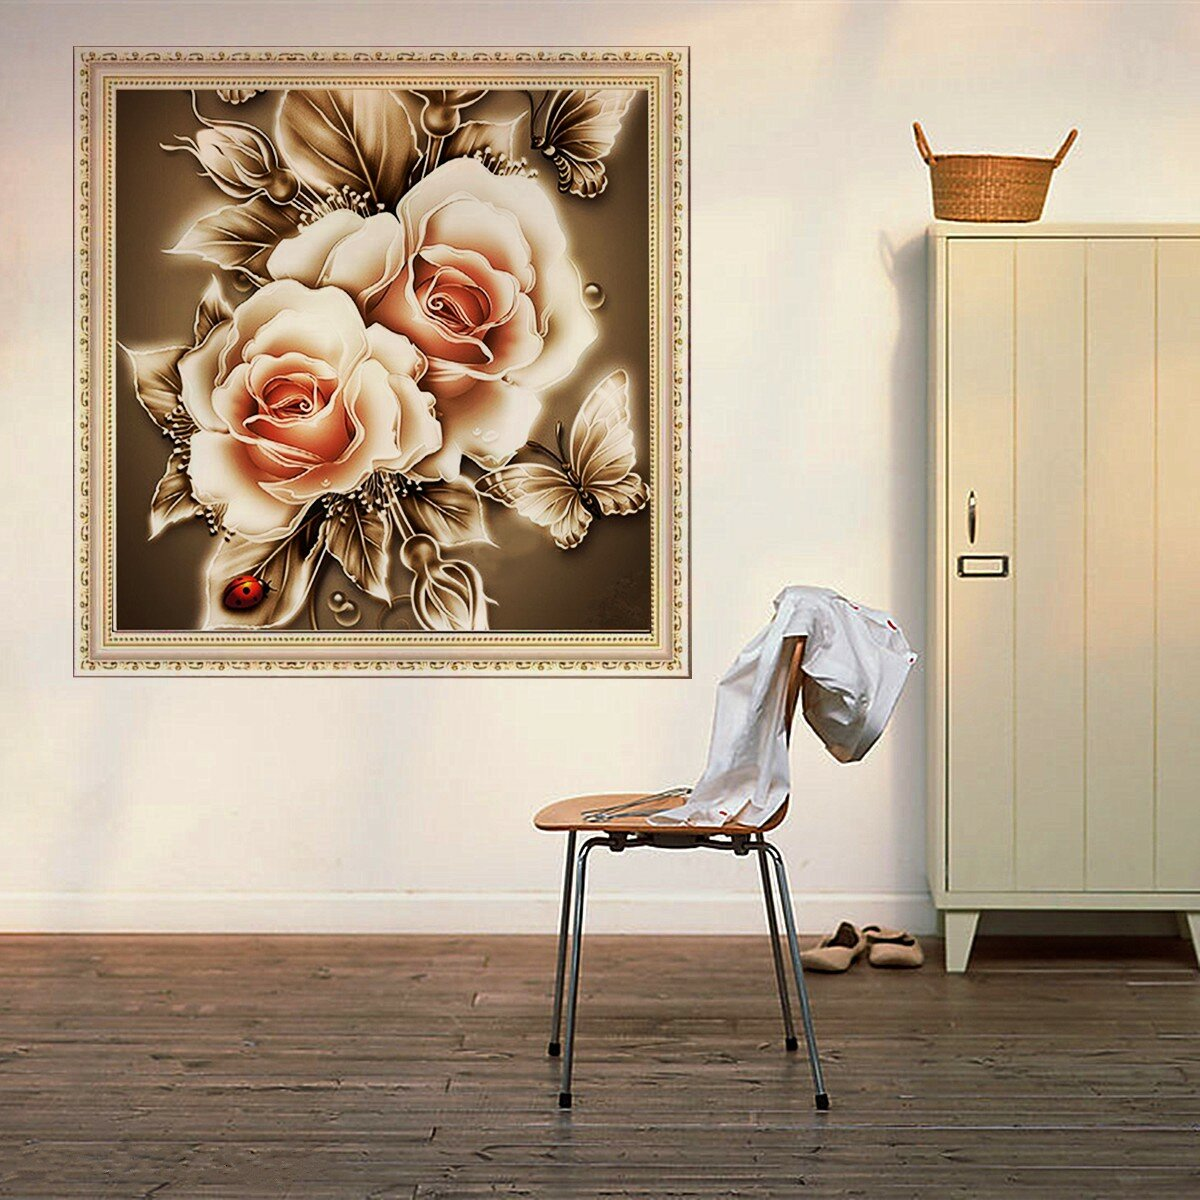 5D DIY Diamond Retro Flower Embroidery Painting Cross Stitch Kit Home Wall Decor